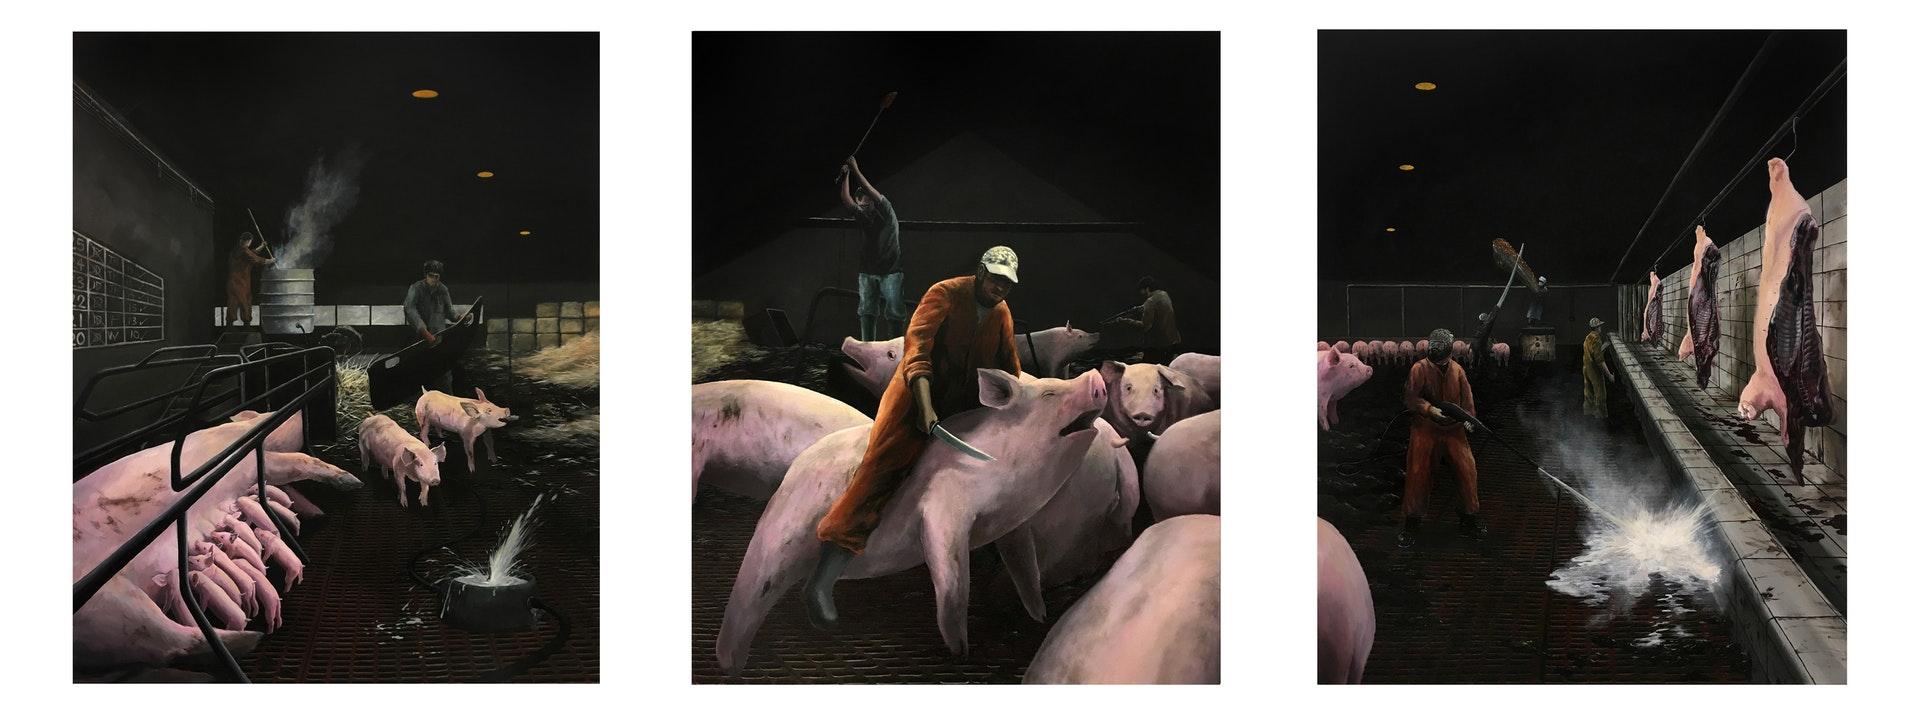 'Pig Farm', Esmond Loh, Acrylic on canvas, 152 x 366 x 2 cm